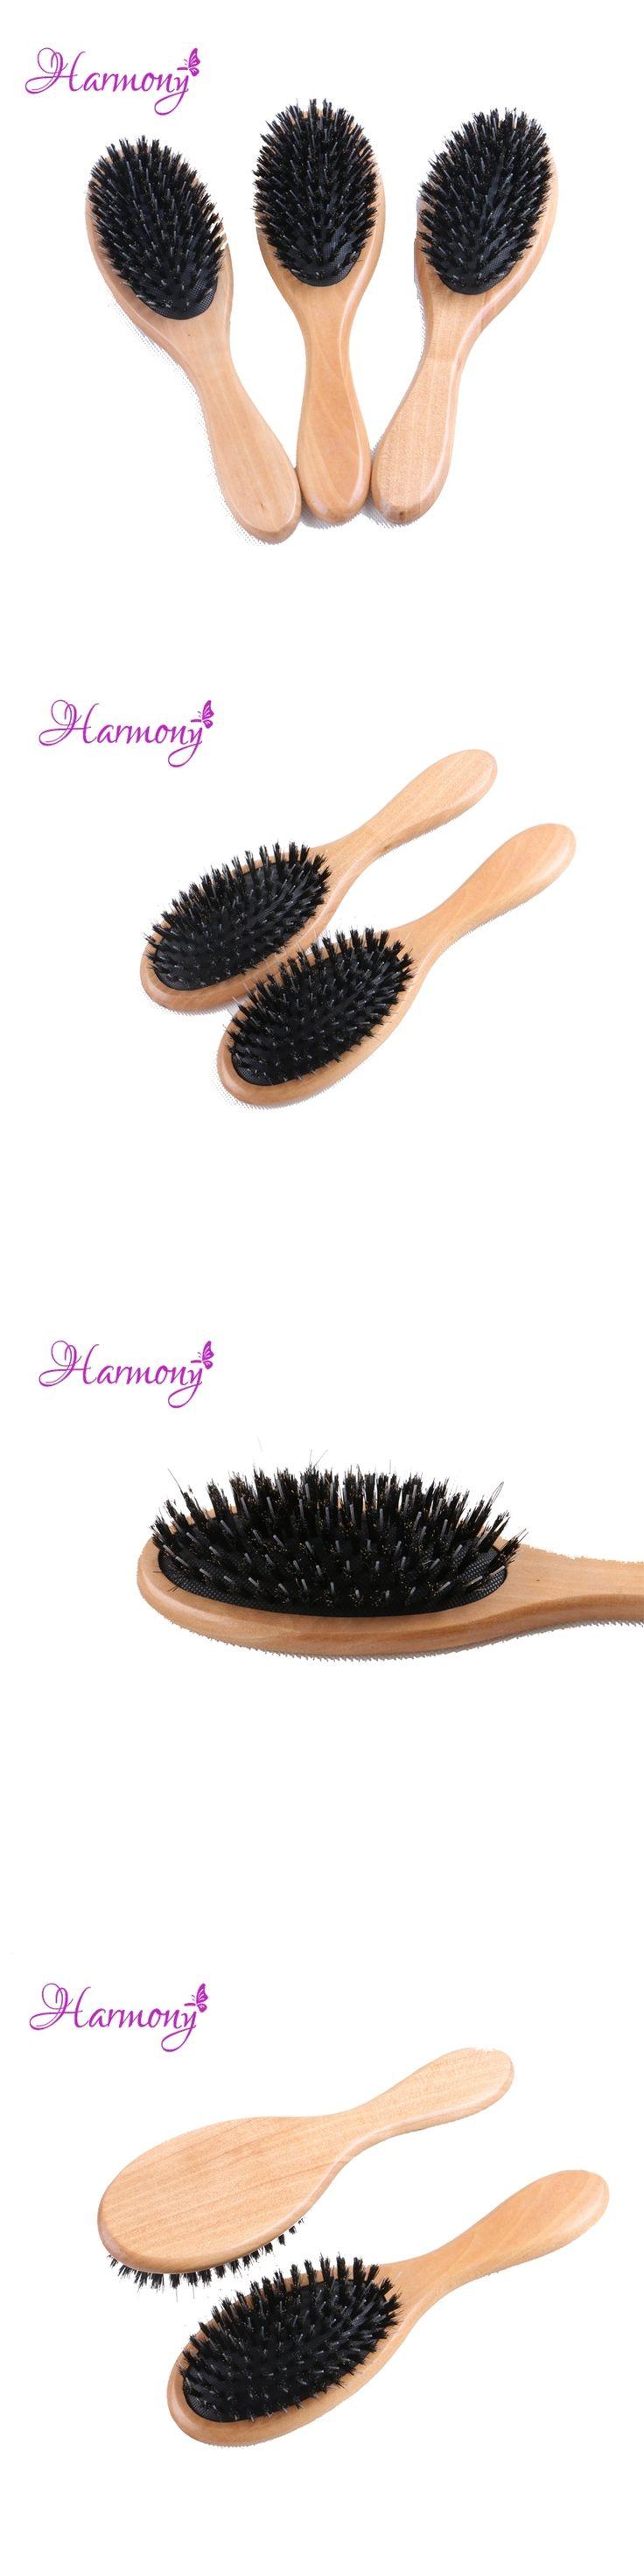 1pcs Harmony Plus Free shipping Varnish Boar Bristle Hair Brush, Hair Extensions Brush for Salon Use, Boar Bristle with Nylon